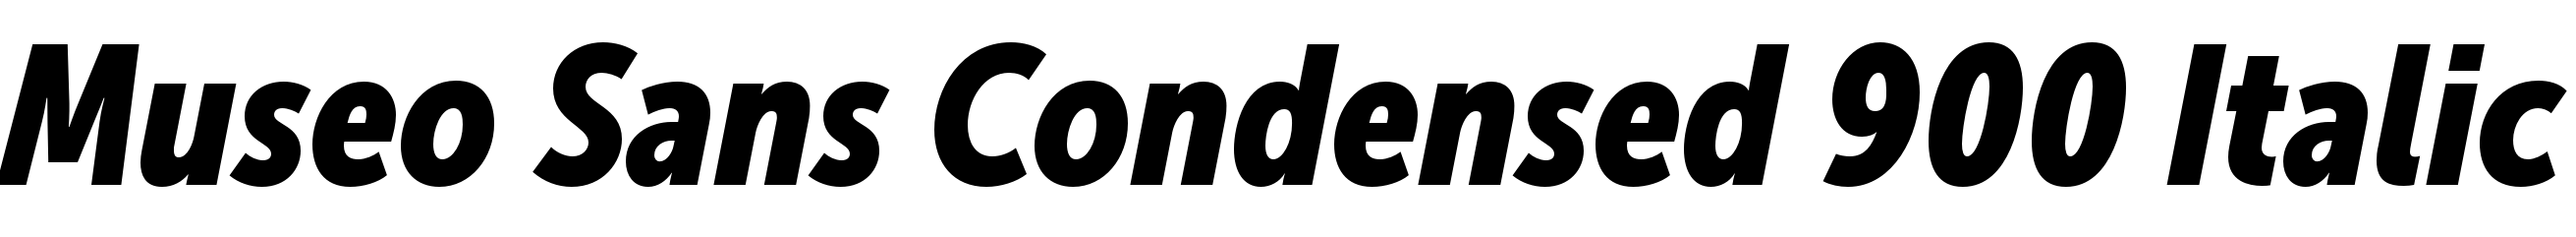 Museo Sans Condensed 900 Italic